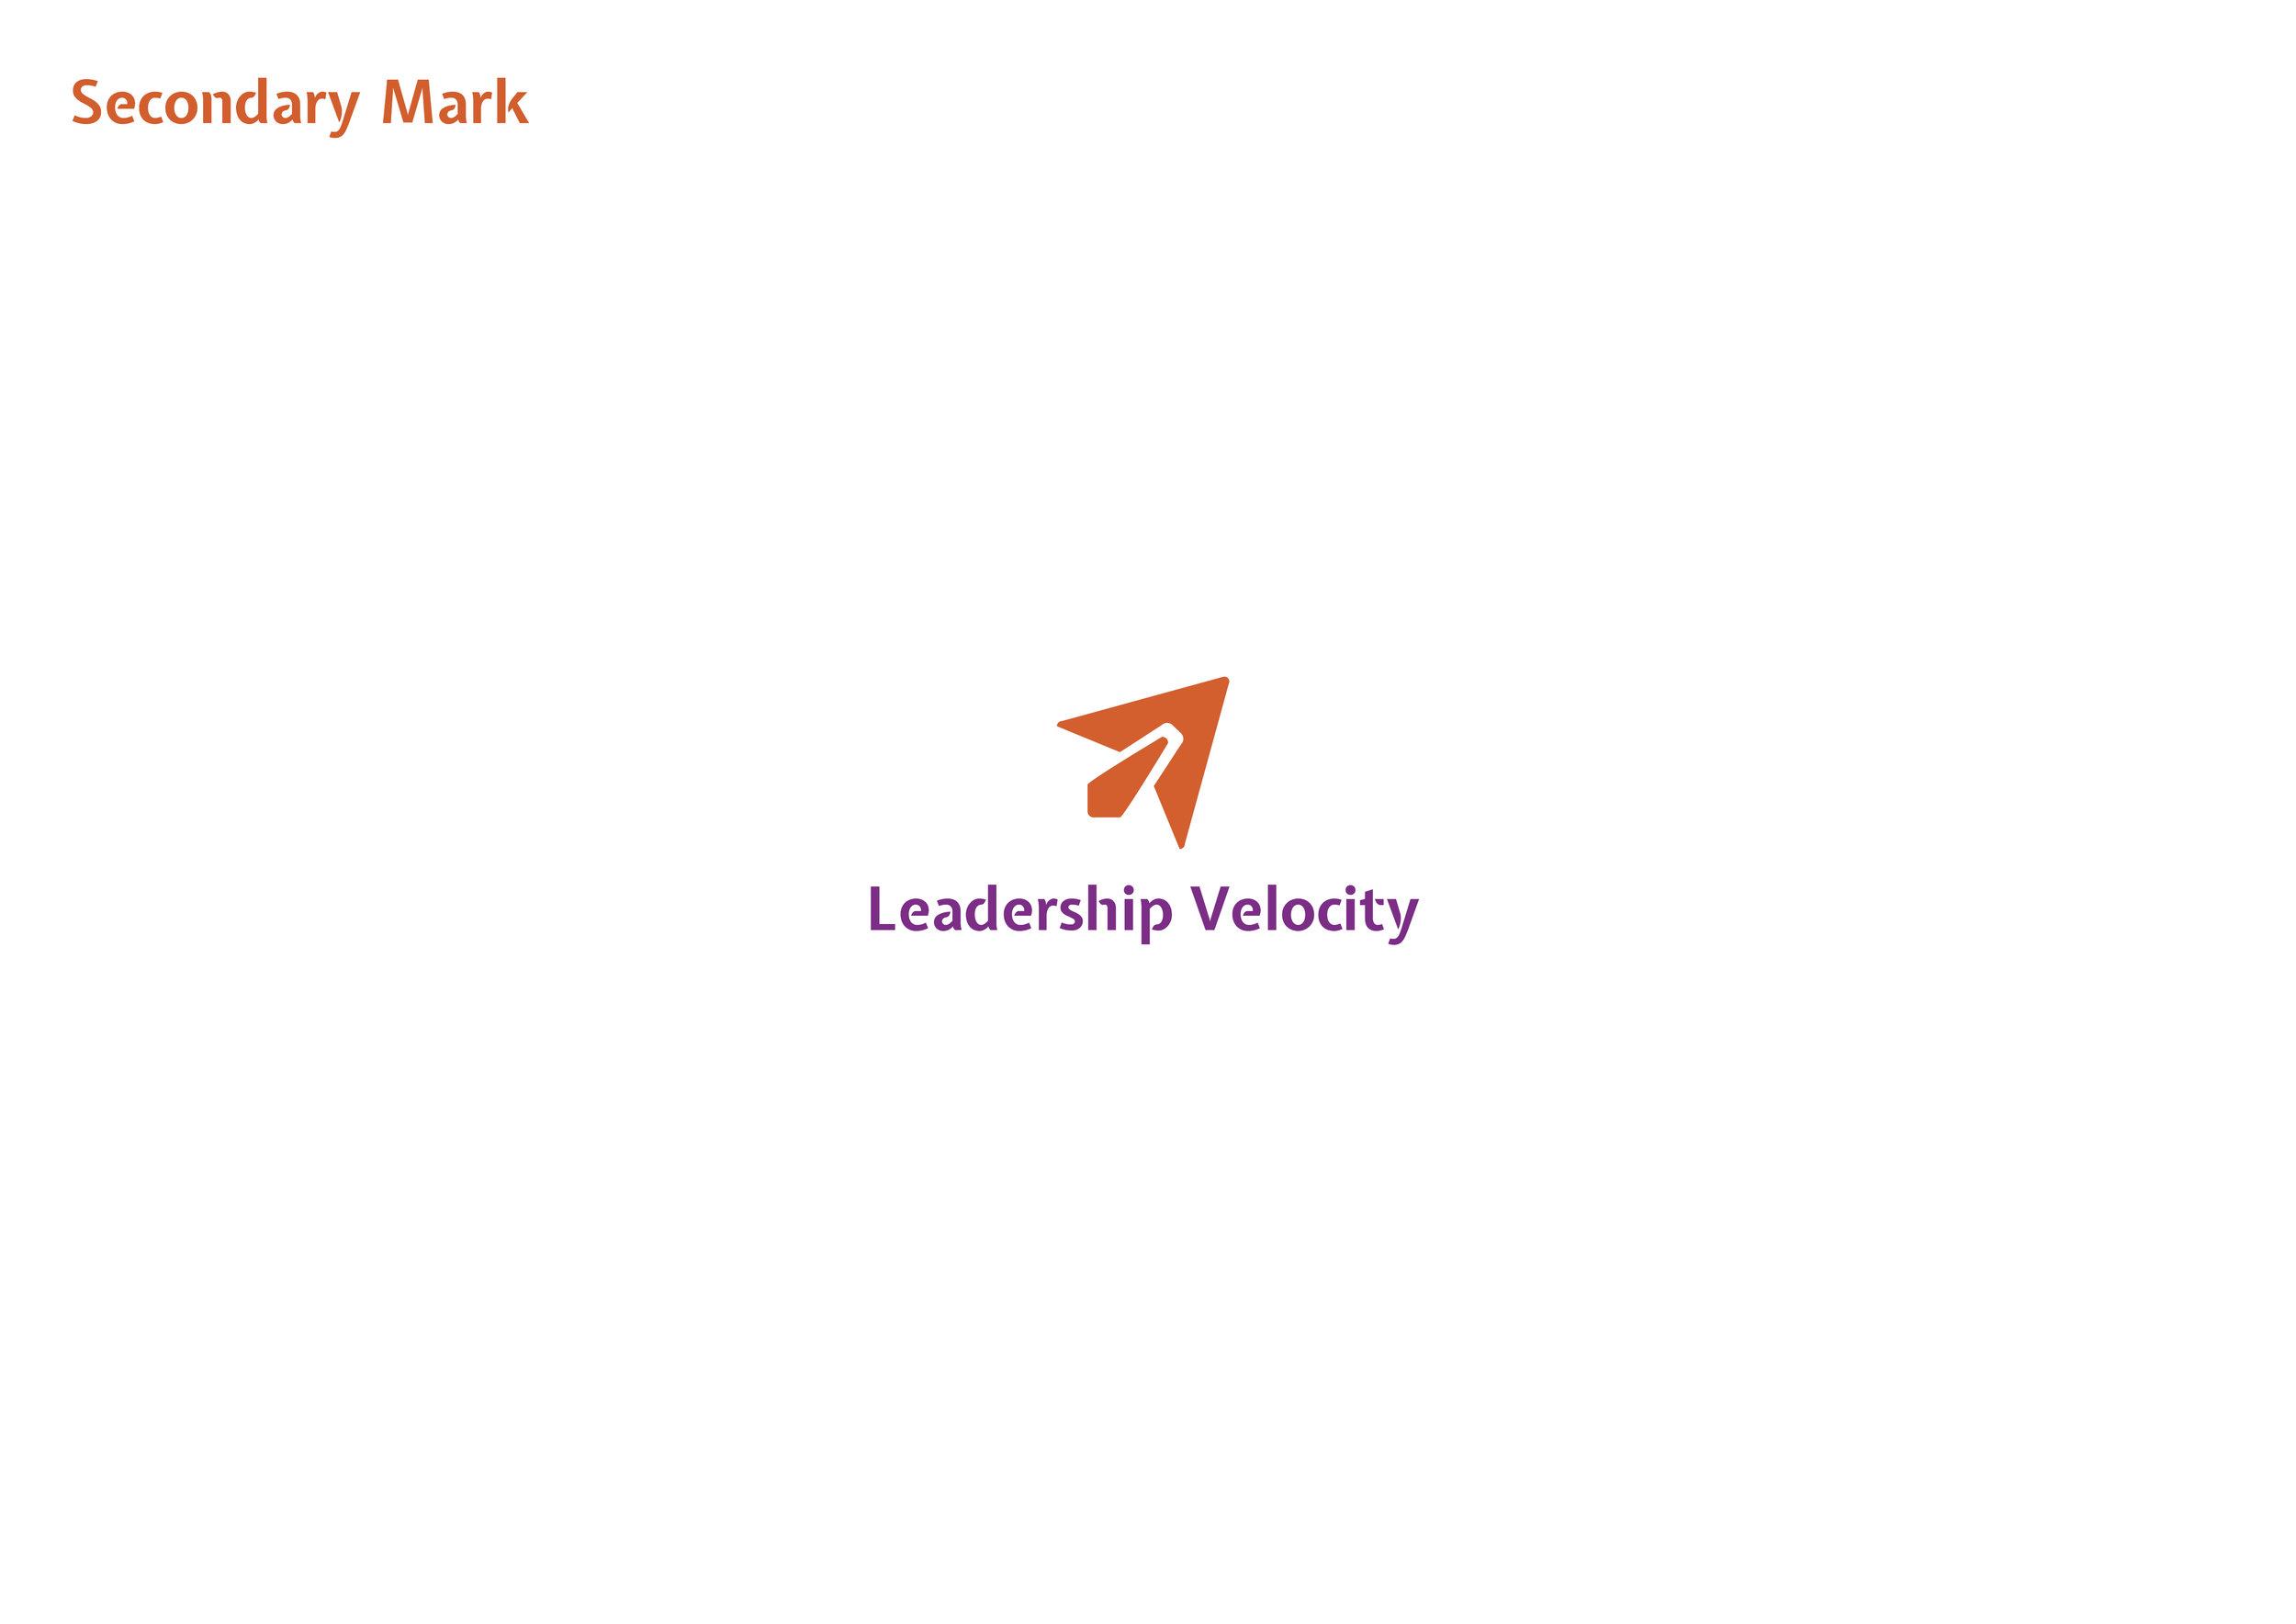 LeadershipVelocity_BrandIdentity_StyleGuide4.jpg